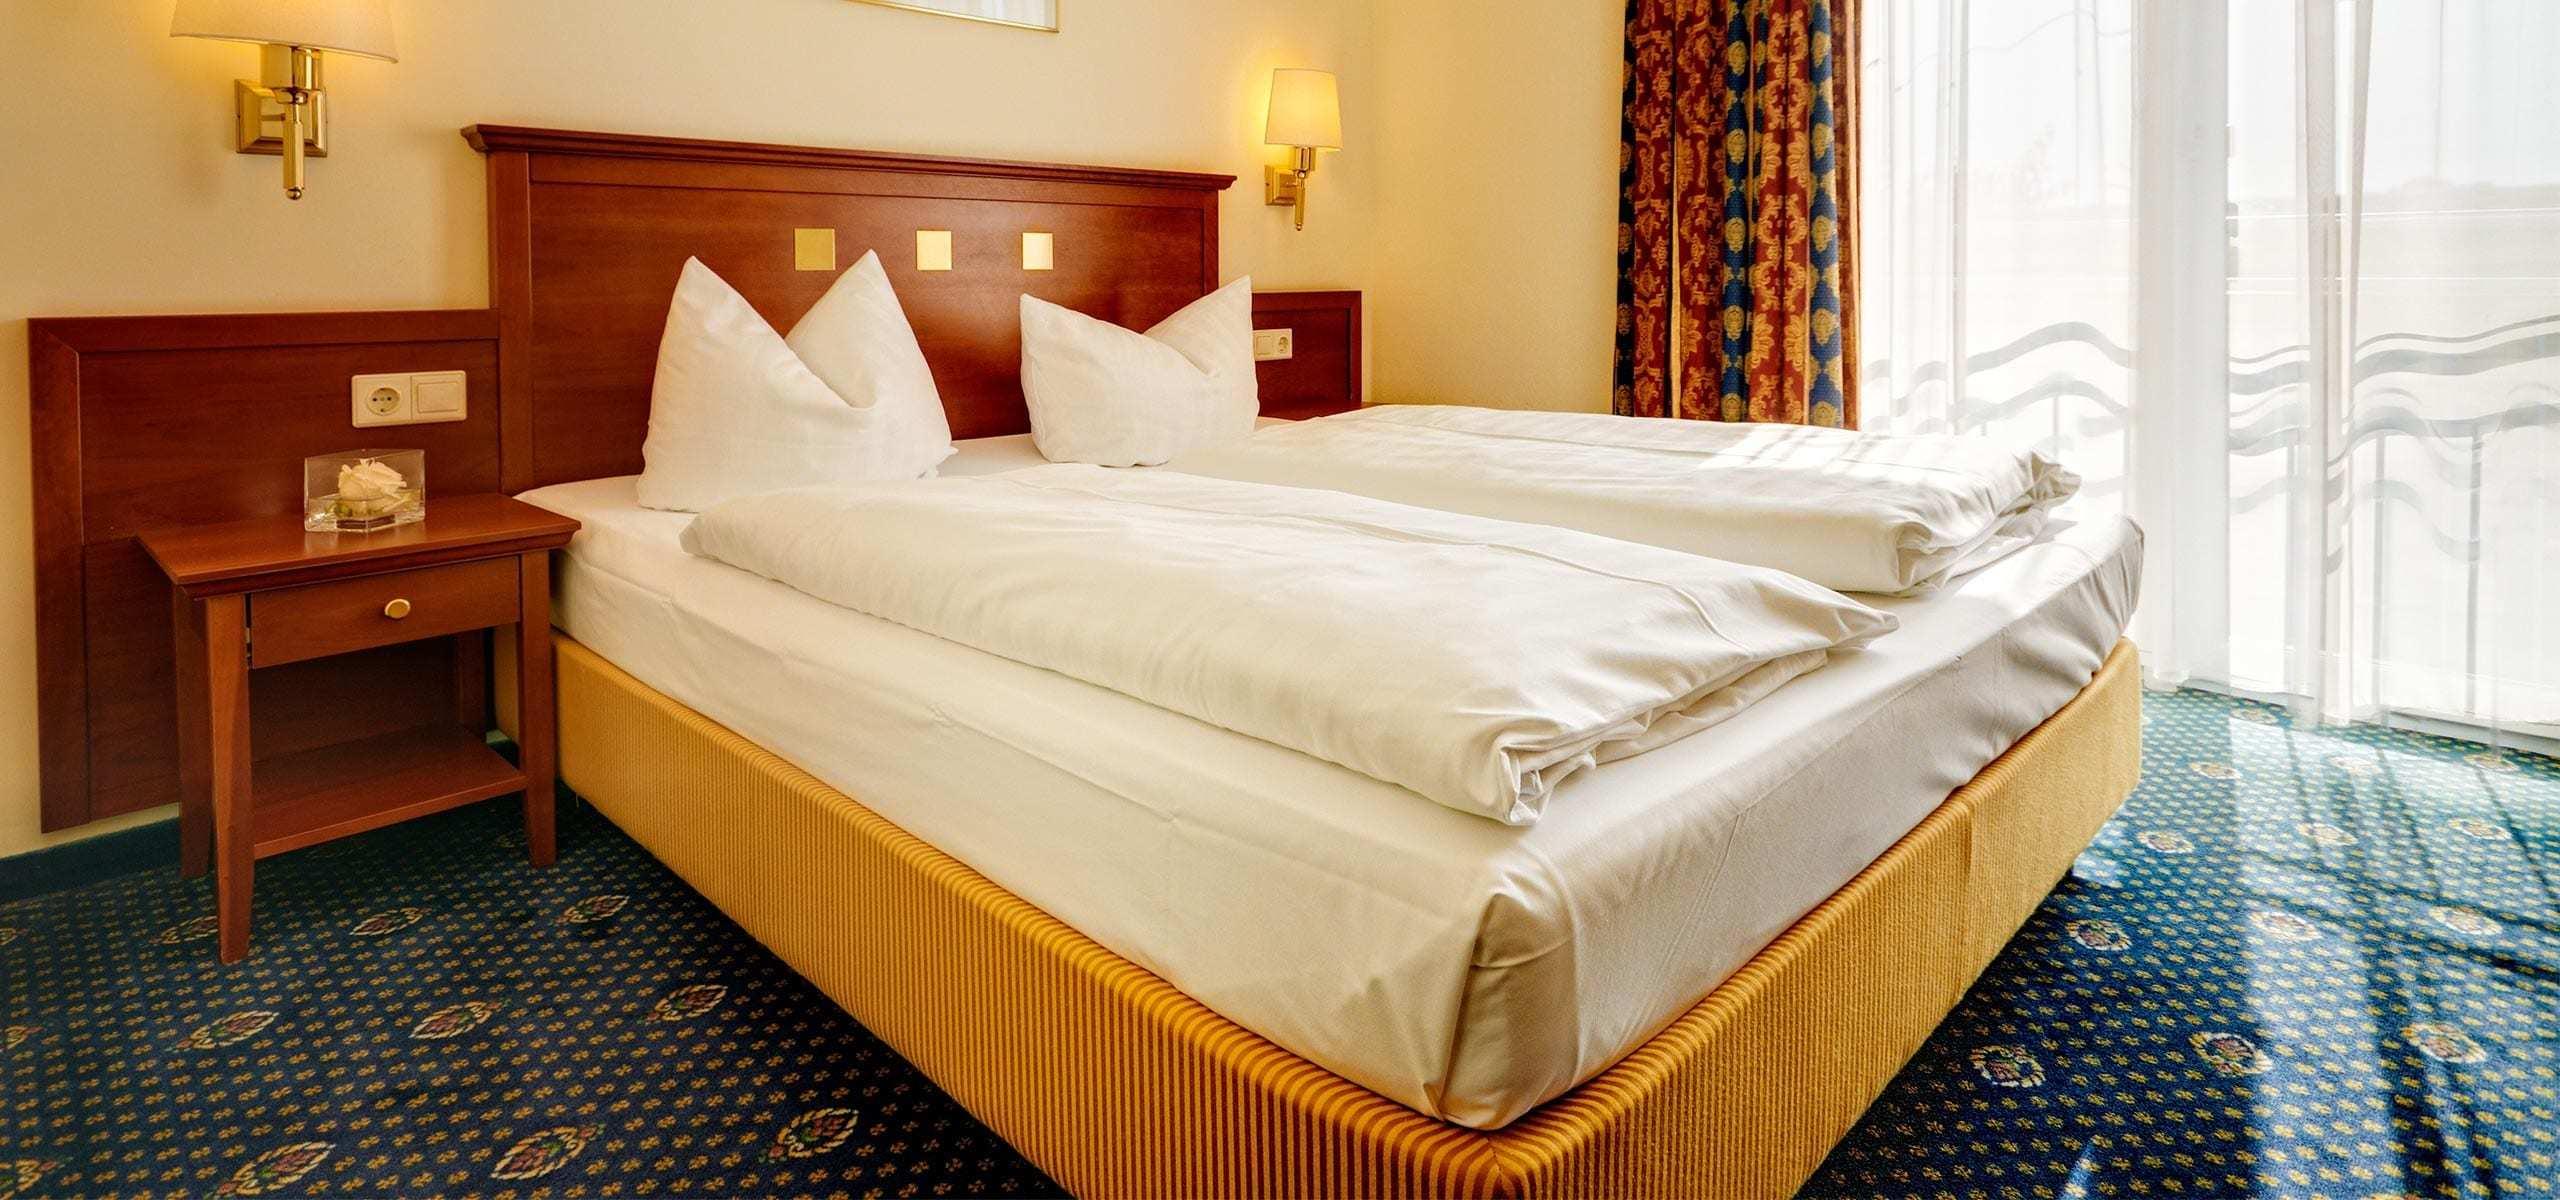 Hotel Hallnberg Zimmer